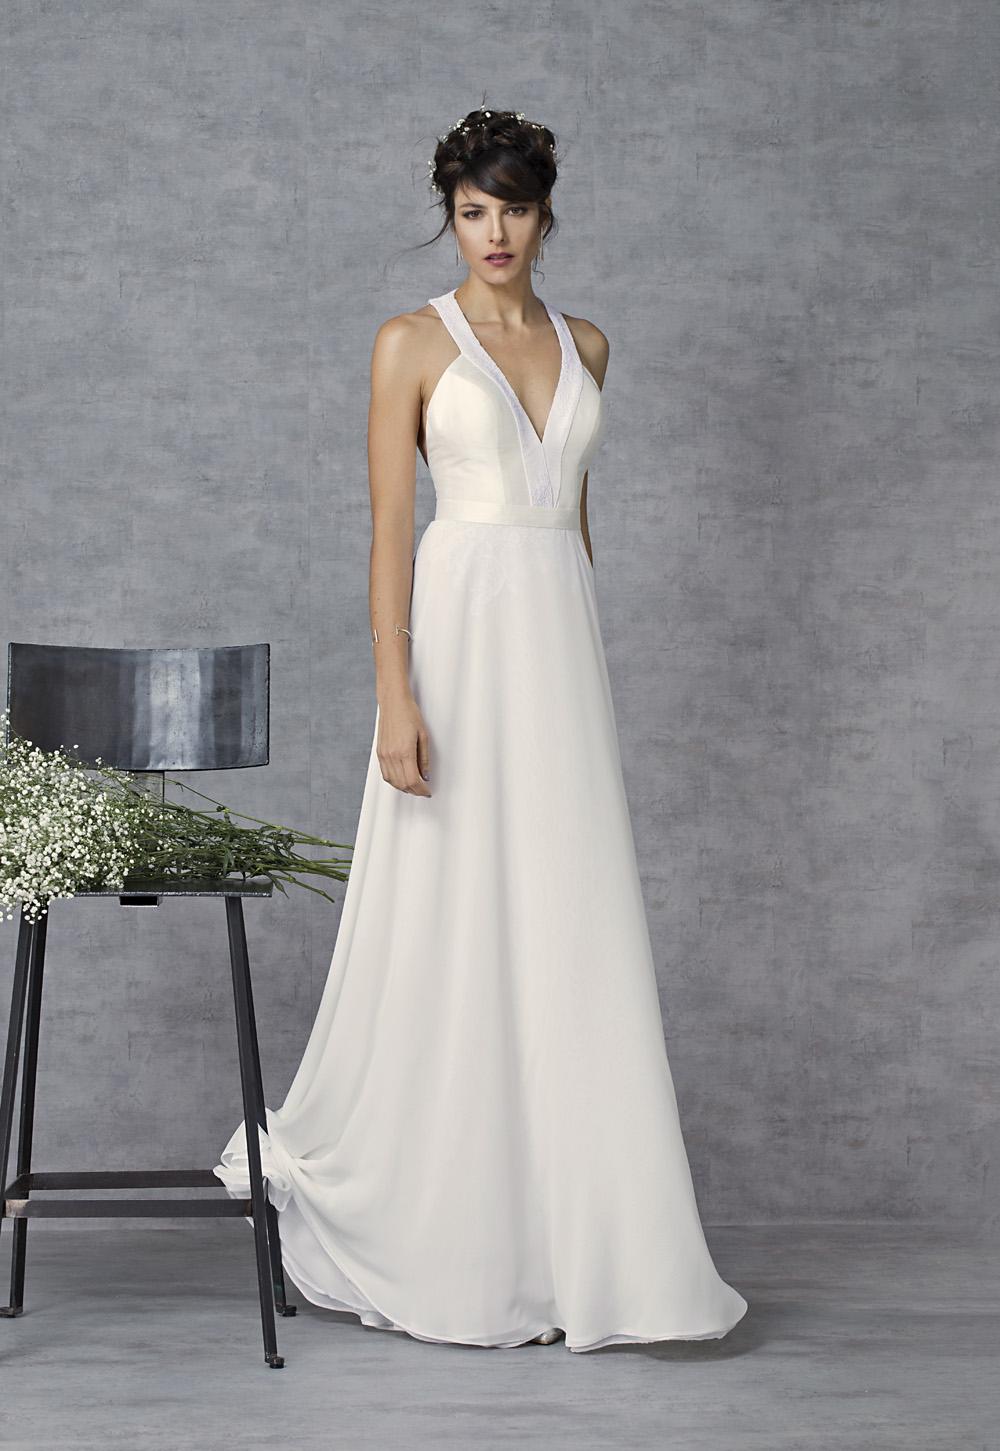 I3A9194 שמלות כלה - שמלה